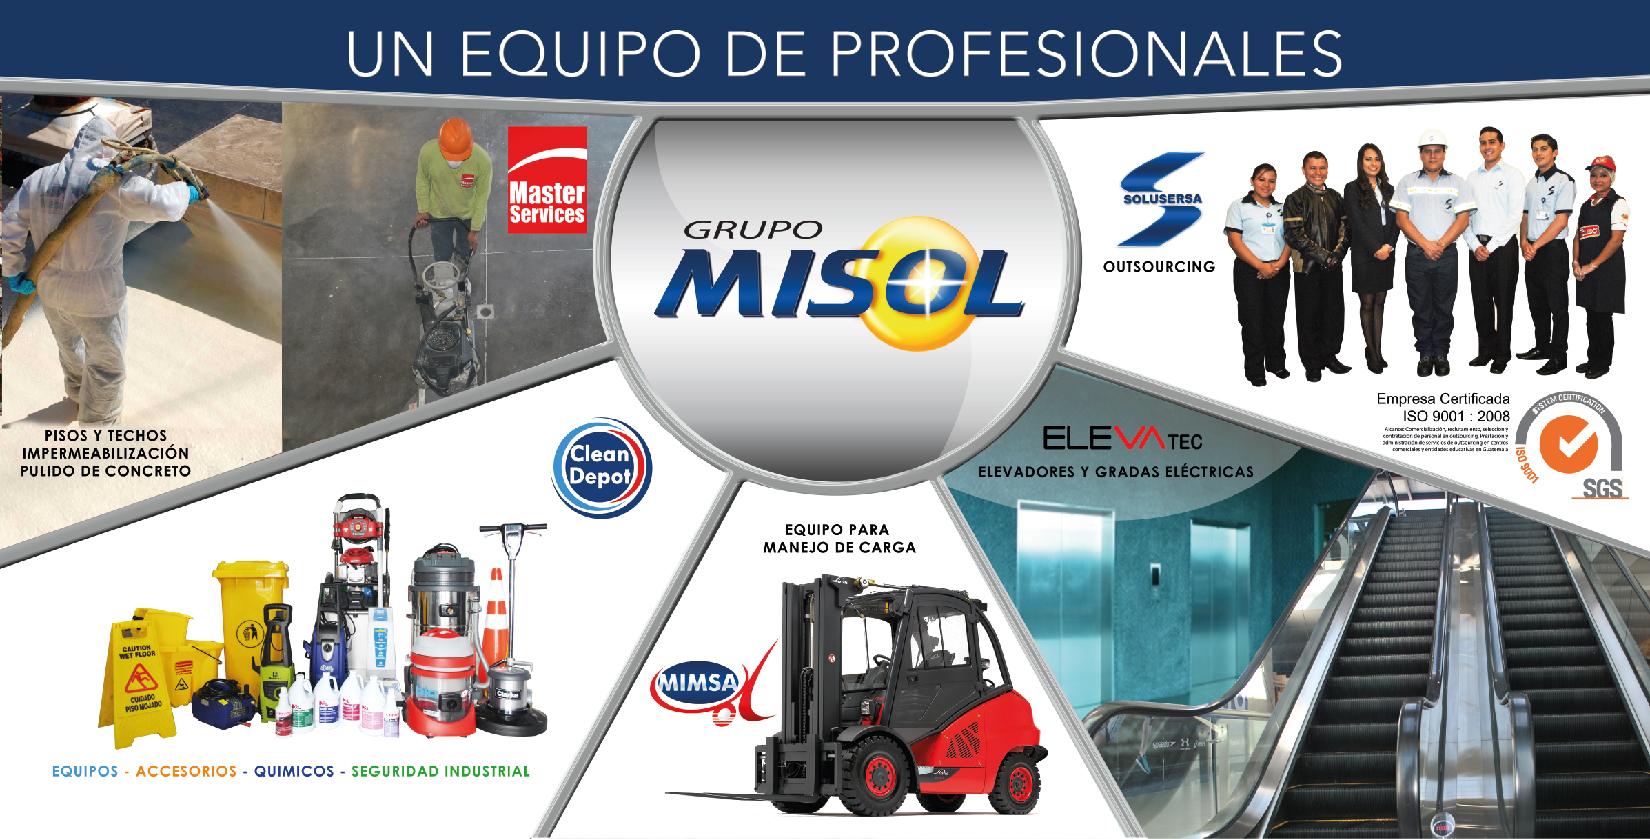 Porta Grupo Misol 2016